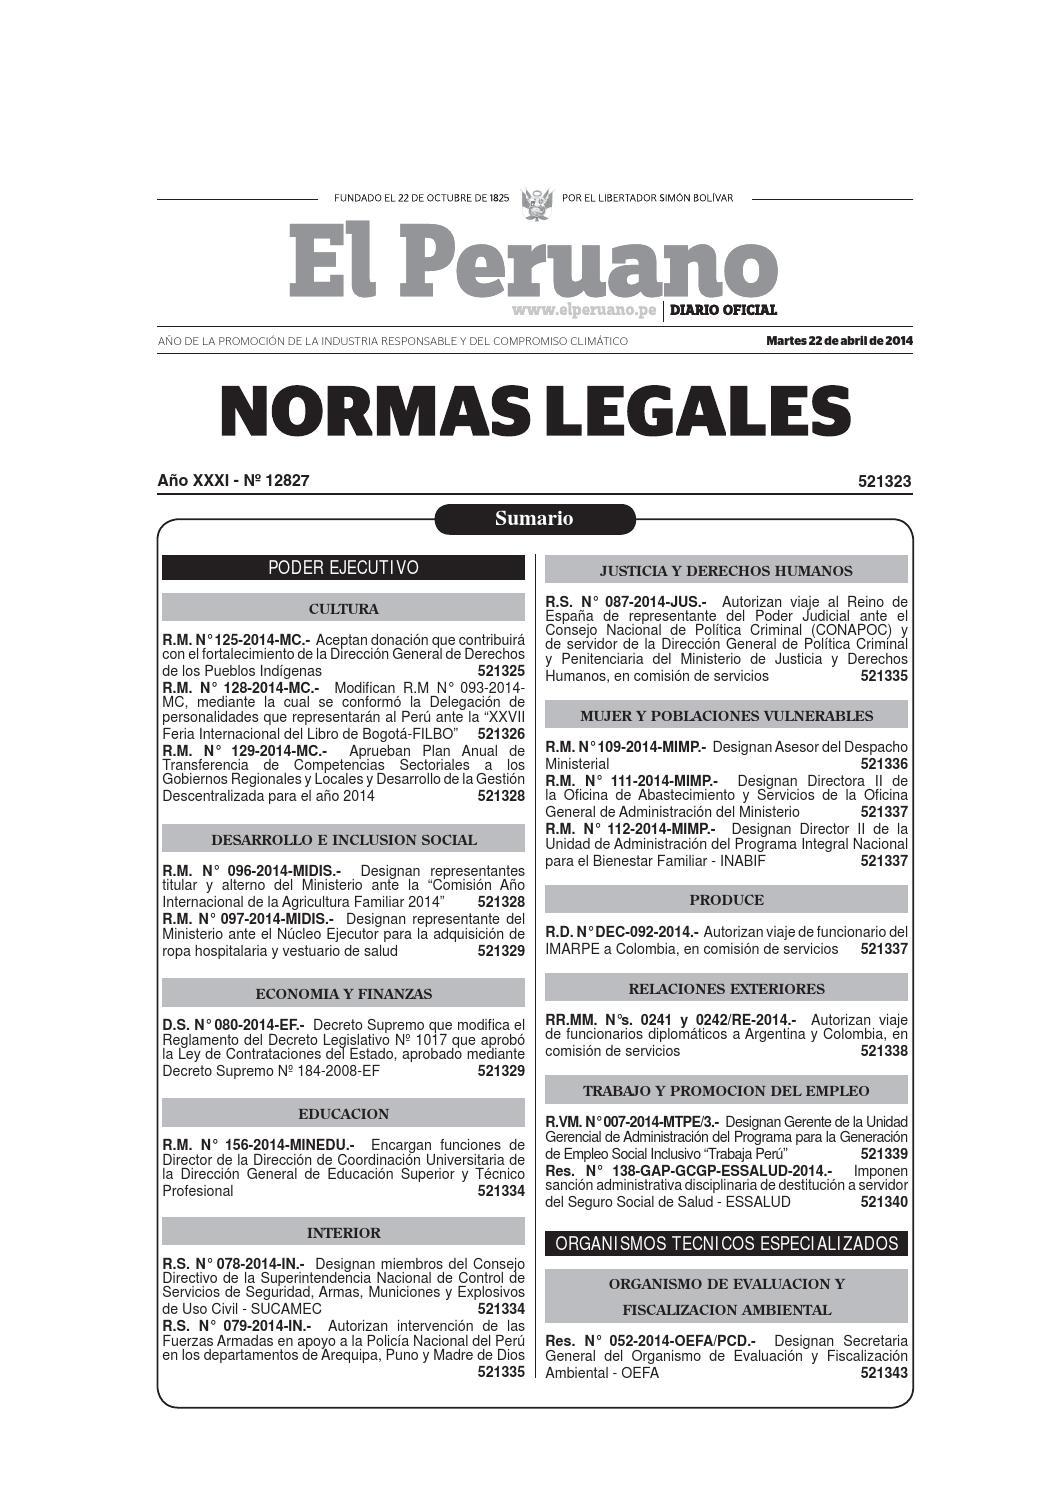 BOLETÍN DEL DIARIO OFICIAL 22 04 2014 by Gaceta Juridica - issuu